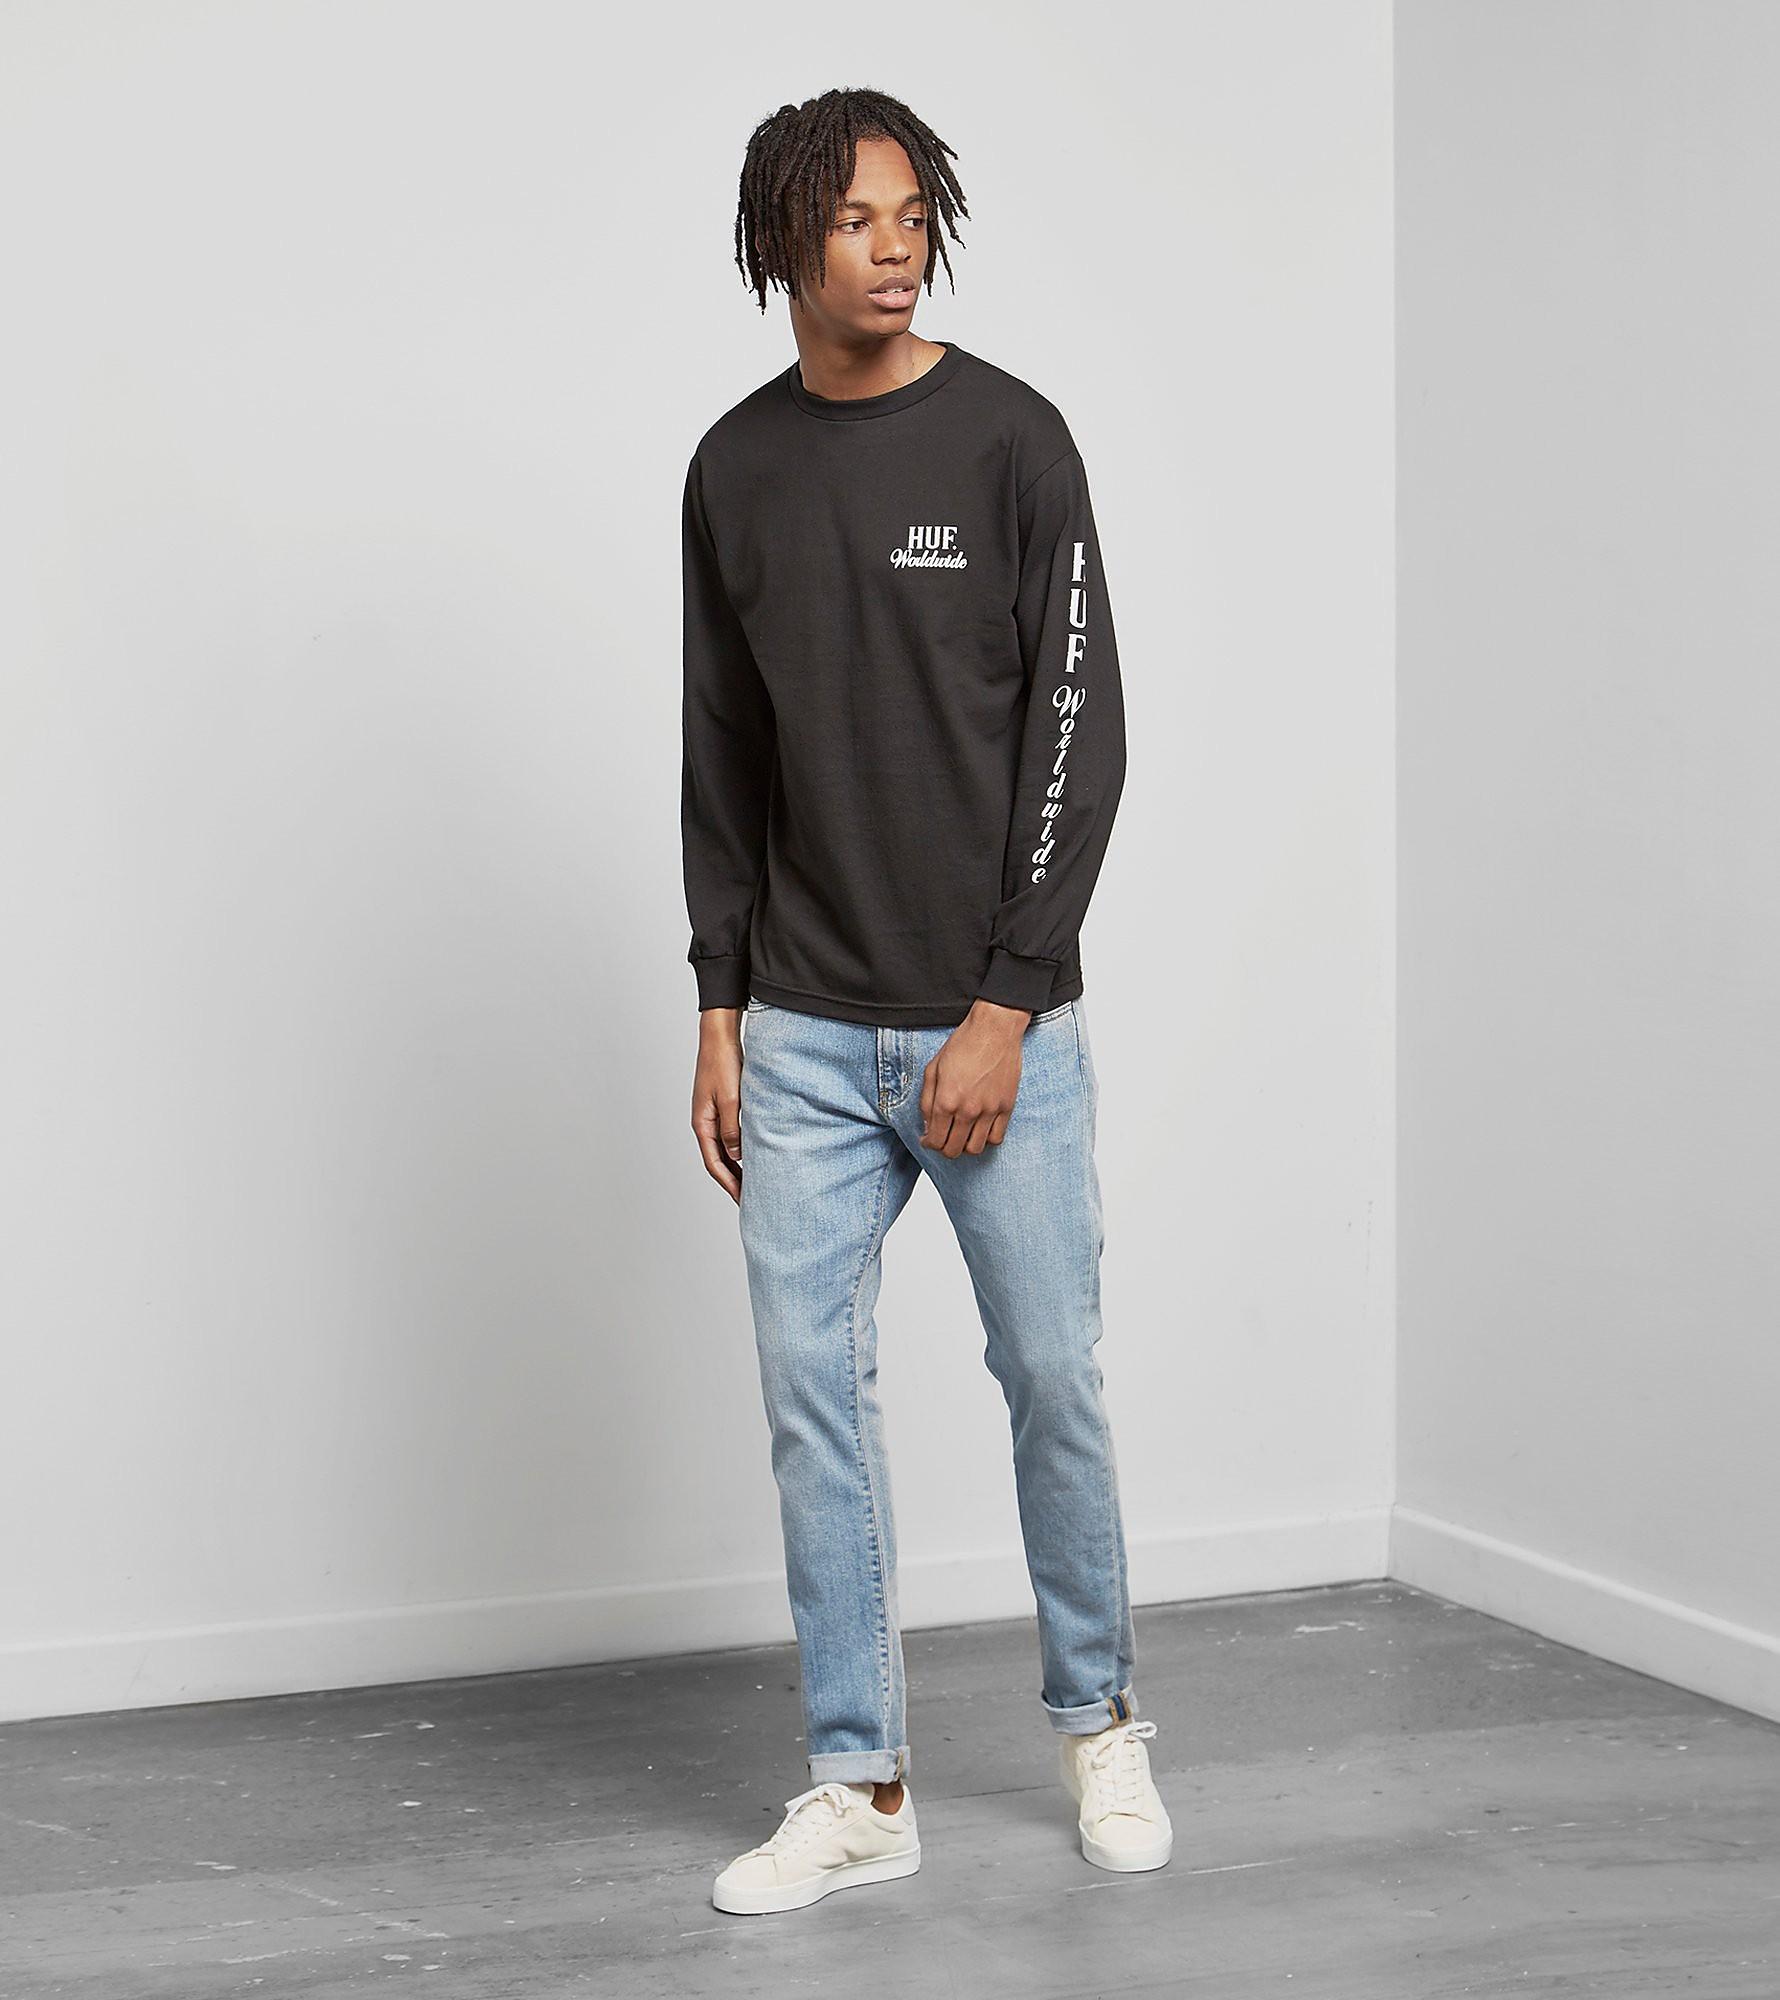 HUF Long-Sleeved Ultra T-Shirt